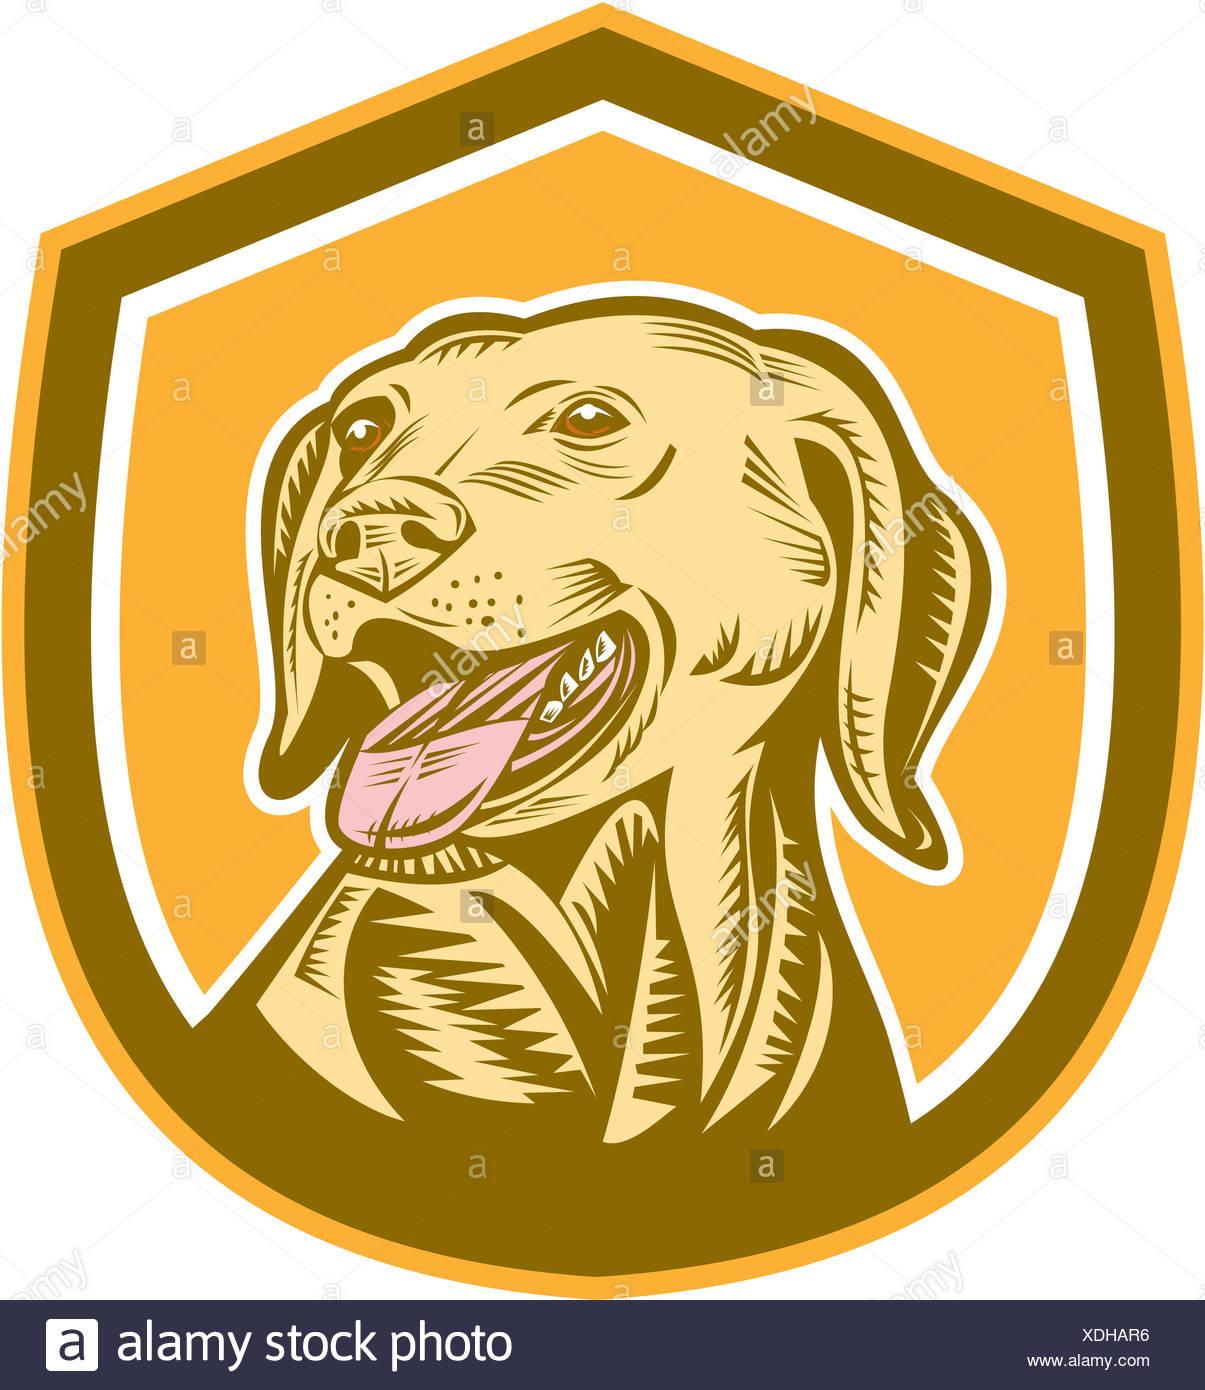 Labrador Dog Head Shield Woodcut - Stock Image